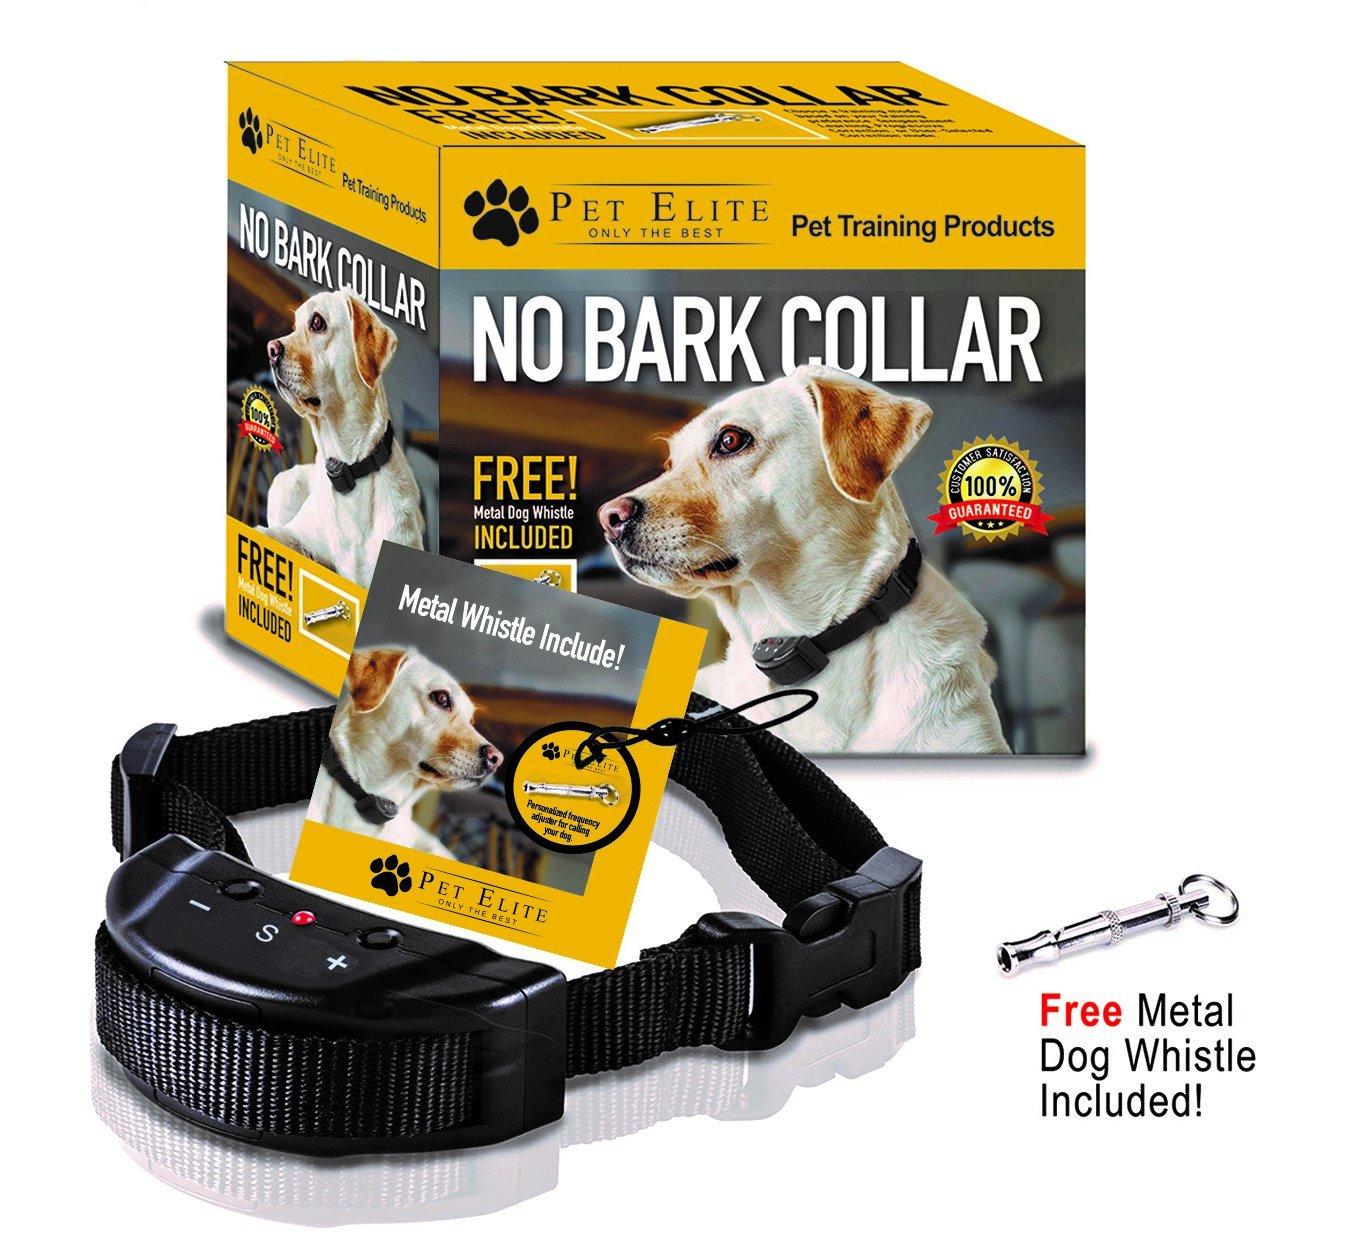 Pet Elite Anti Bark Dog Shock Collar - Humane No Harm Pet Safe Training Control